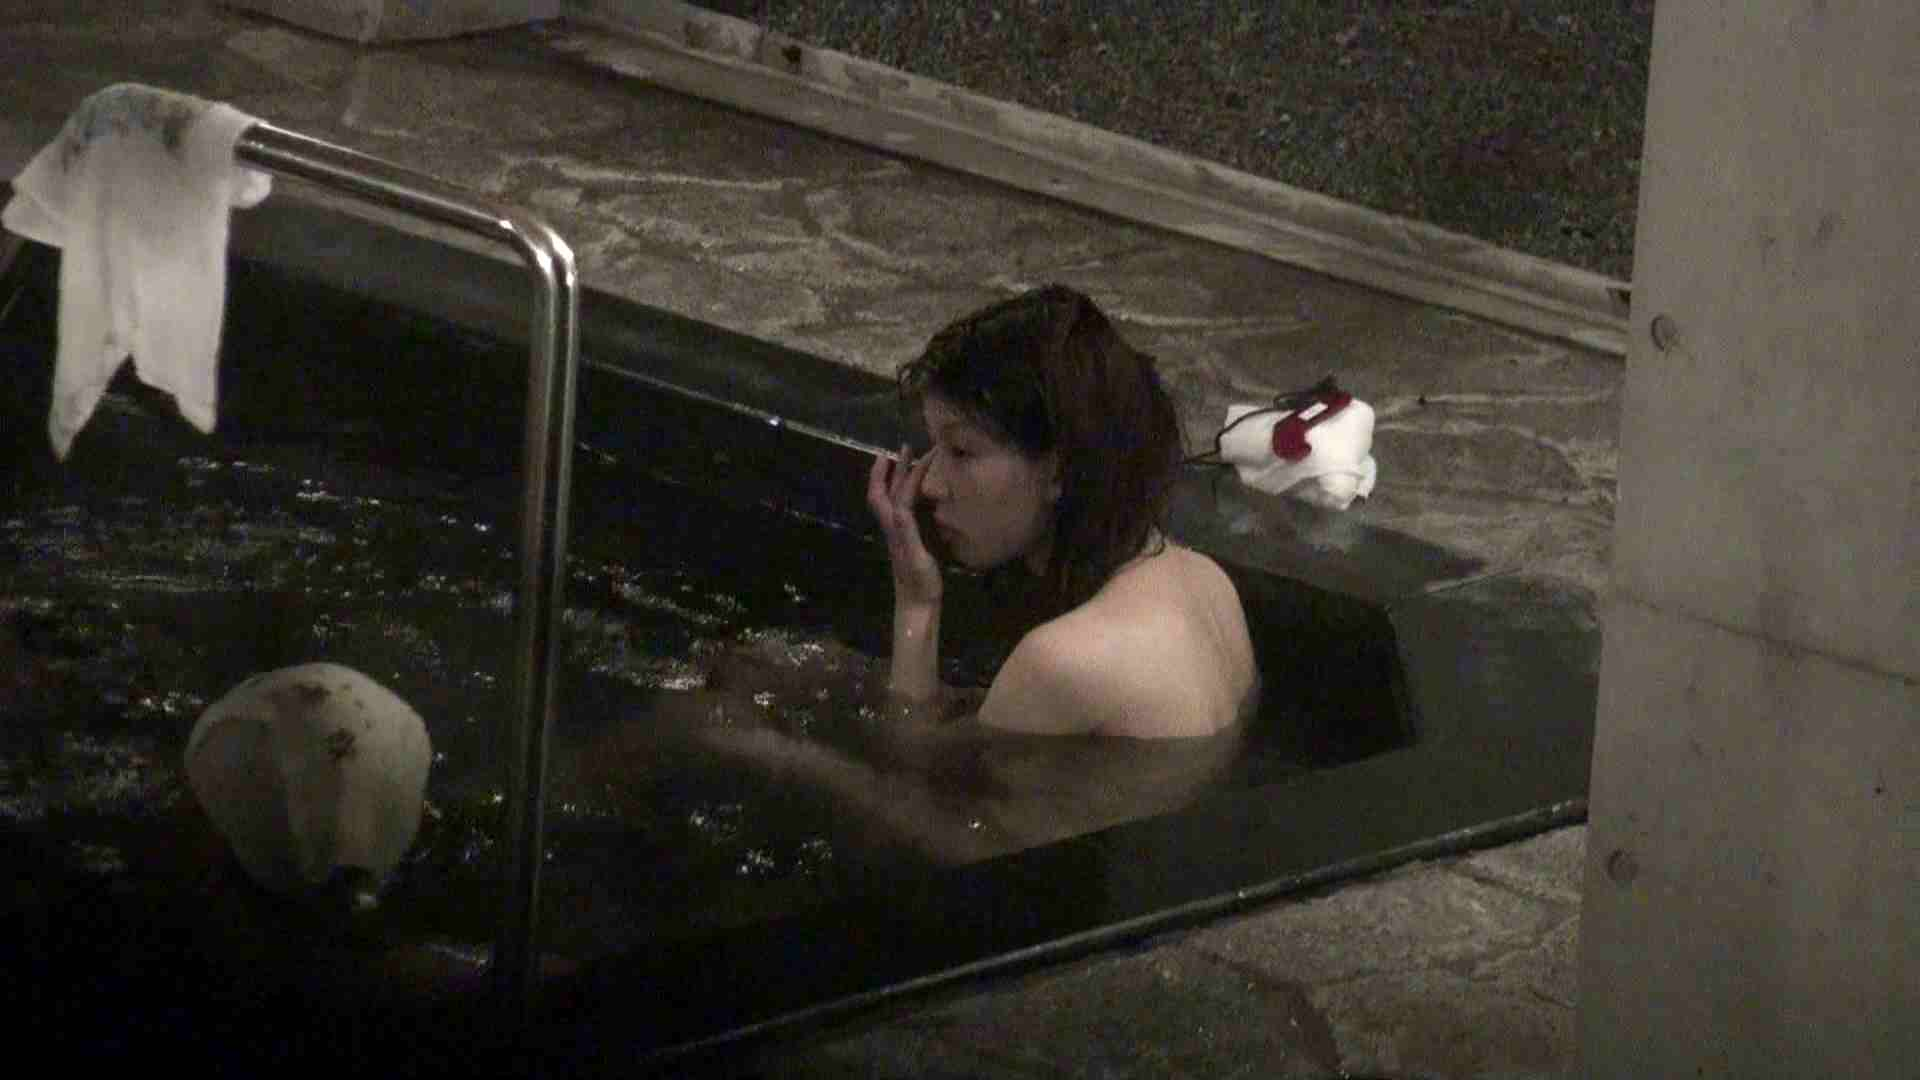 Aquaな露天風呂Vol.371 エロいOL | 0  73枚